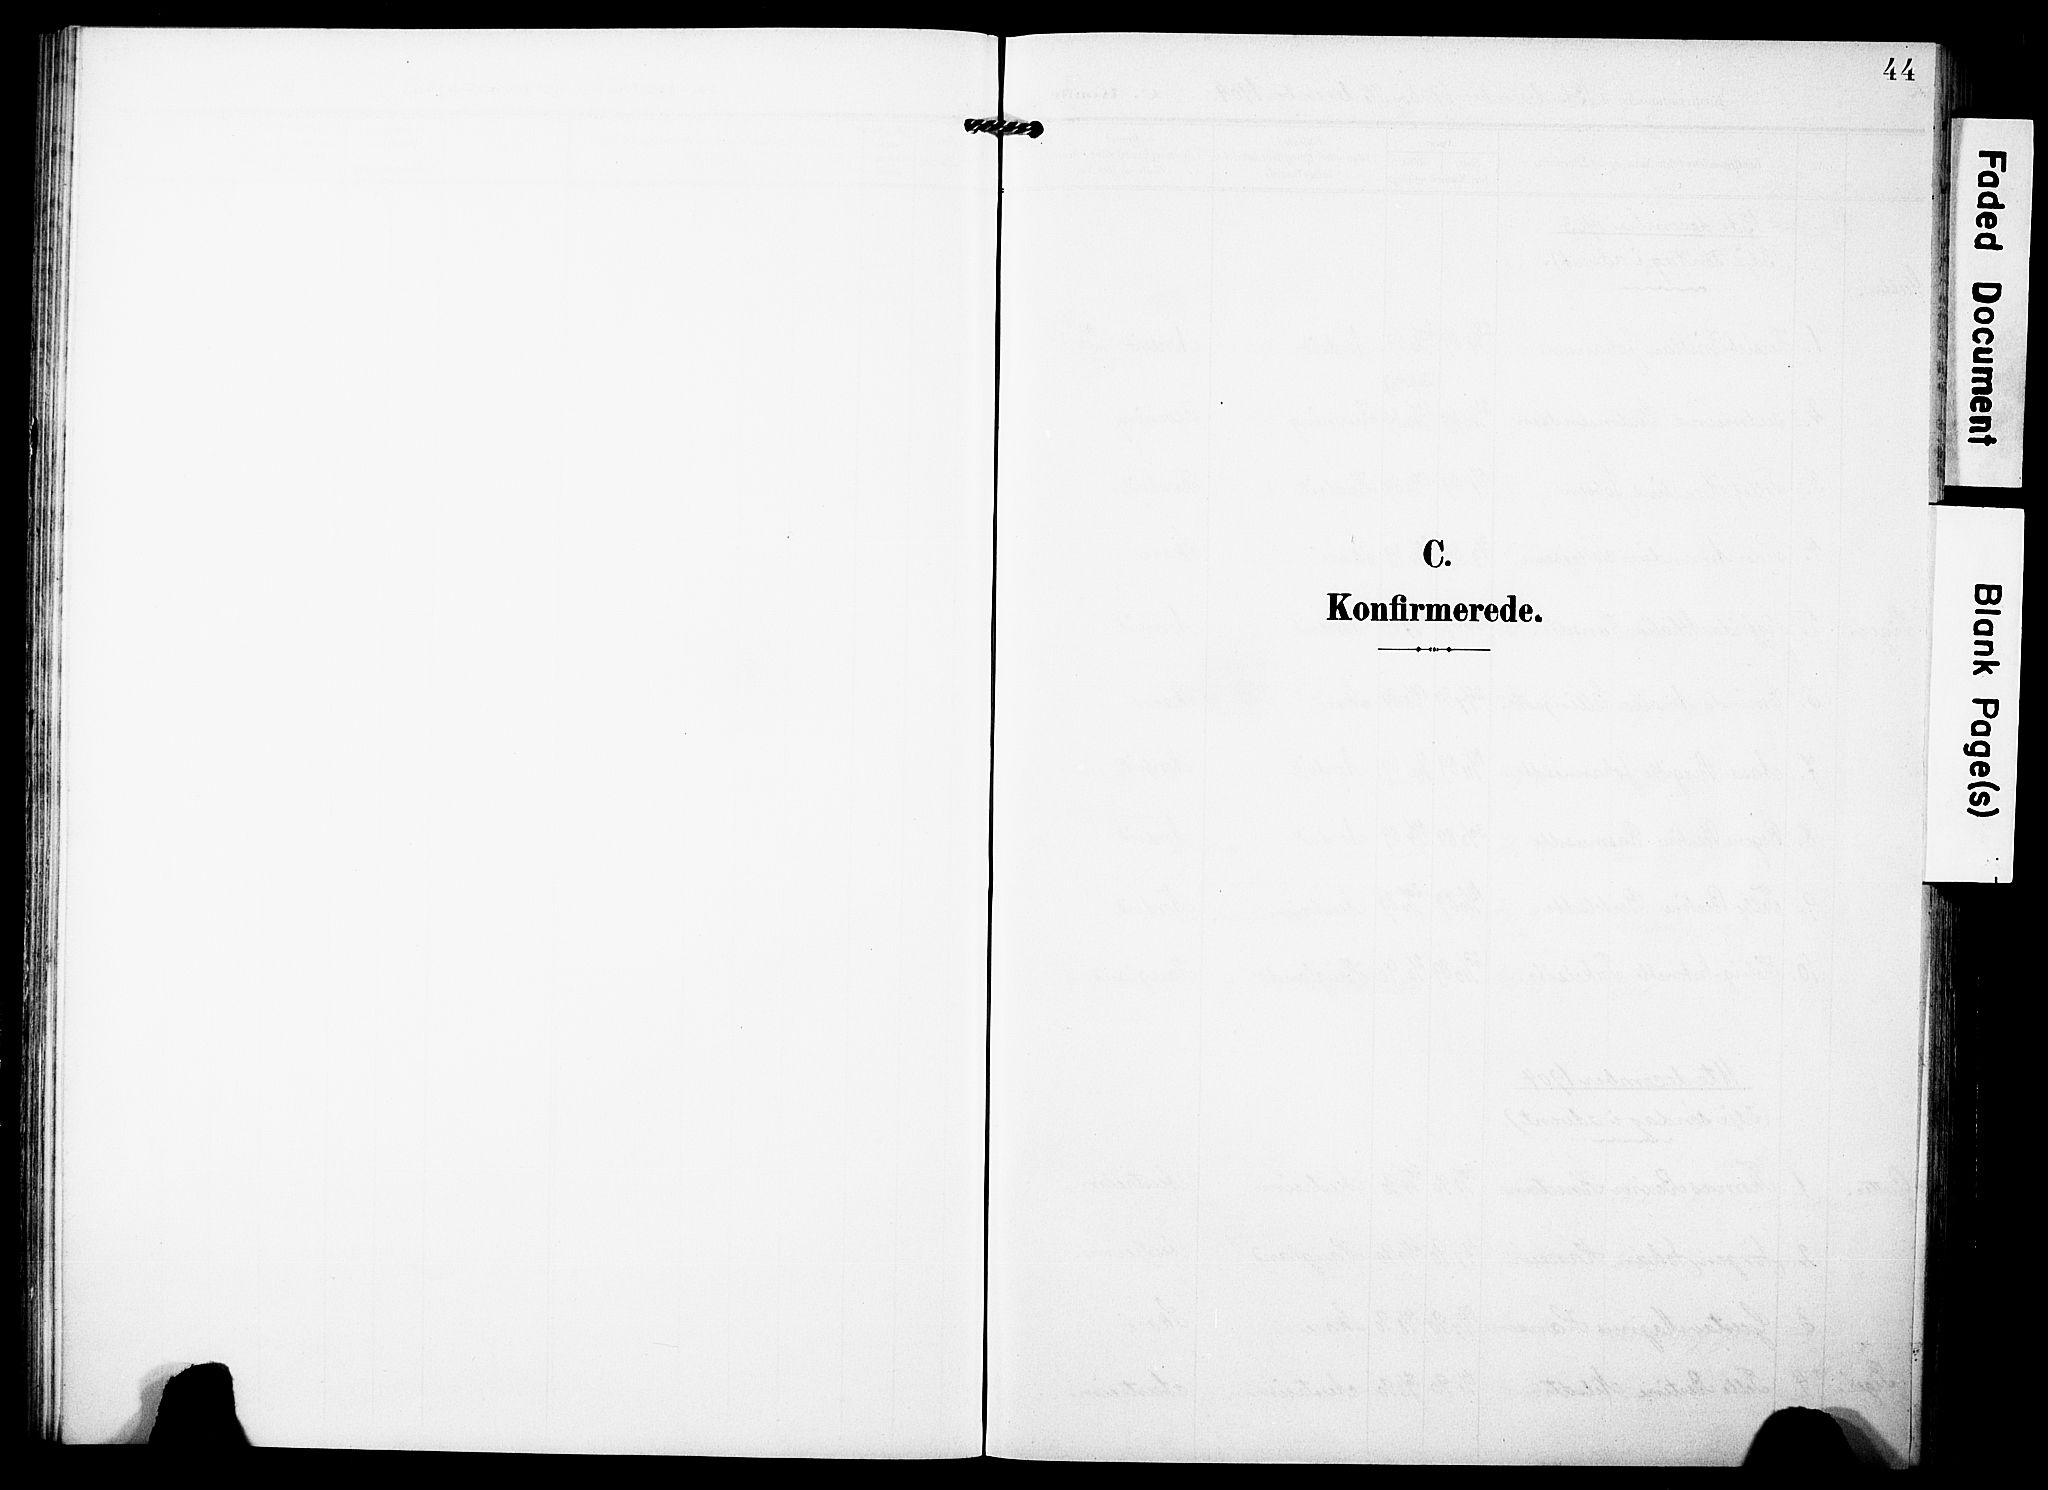 SAST, Torvastad sokneprestkontor, H/Ha/Haa/L0018: Ministerialbok nr. A 17, 1903-1925, s. 44